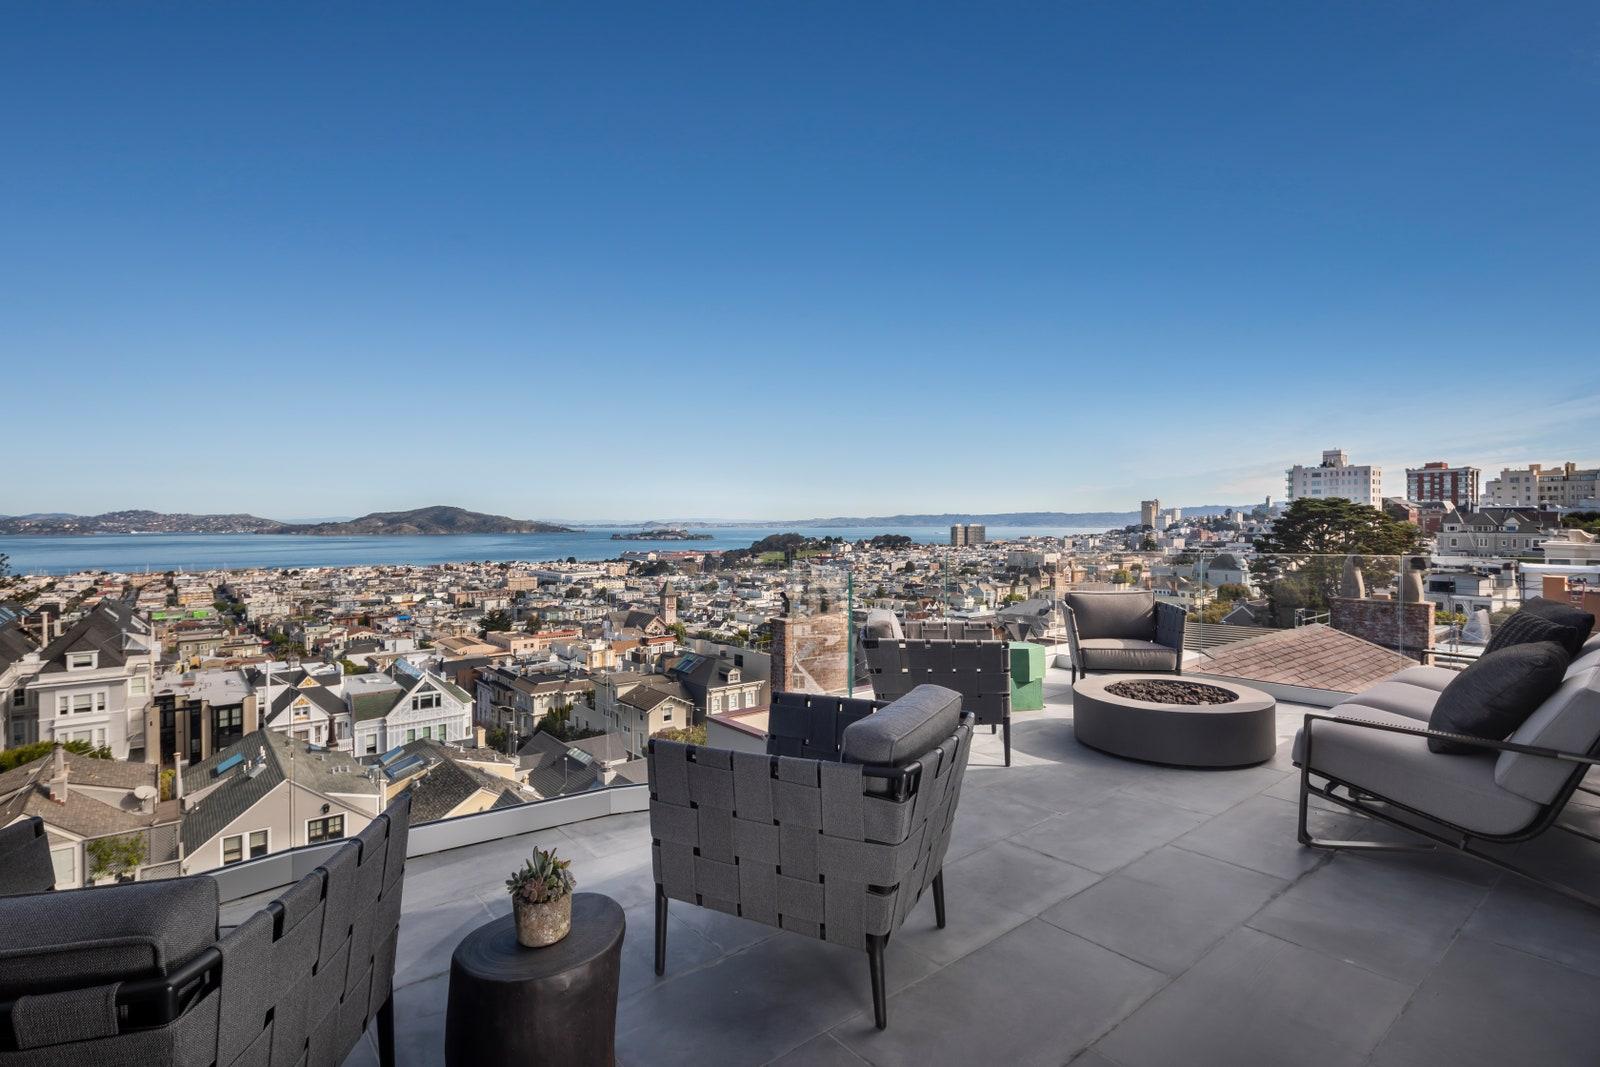 a3dd5 00810922%2821%29 Meg Ryans Former San Francisco Home Sells for $17.3 million